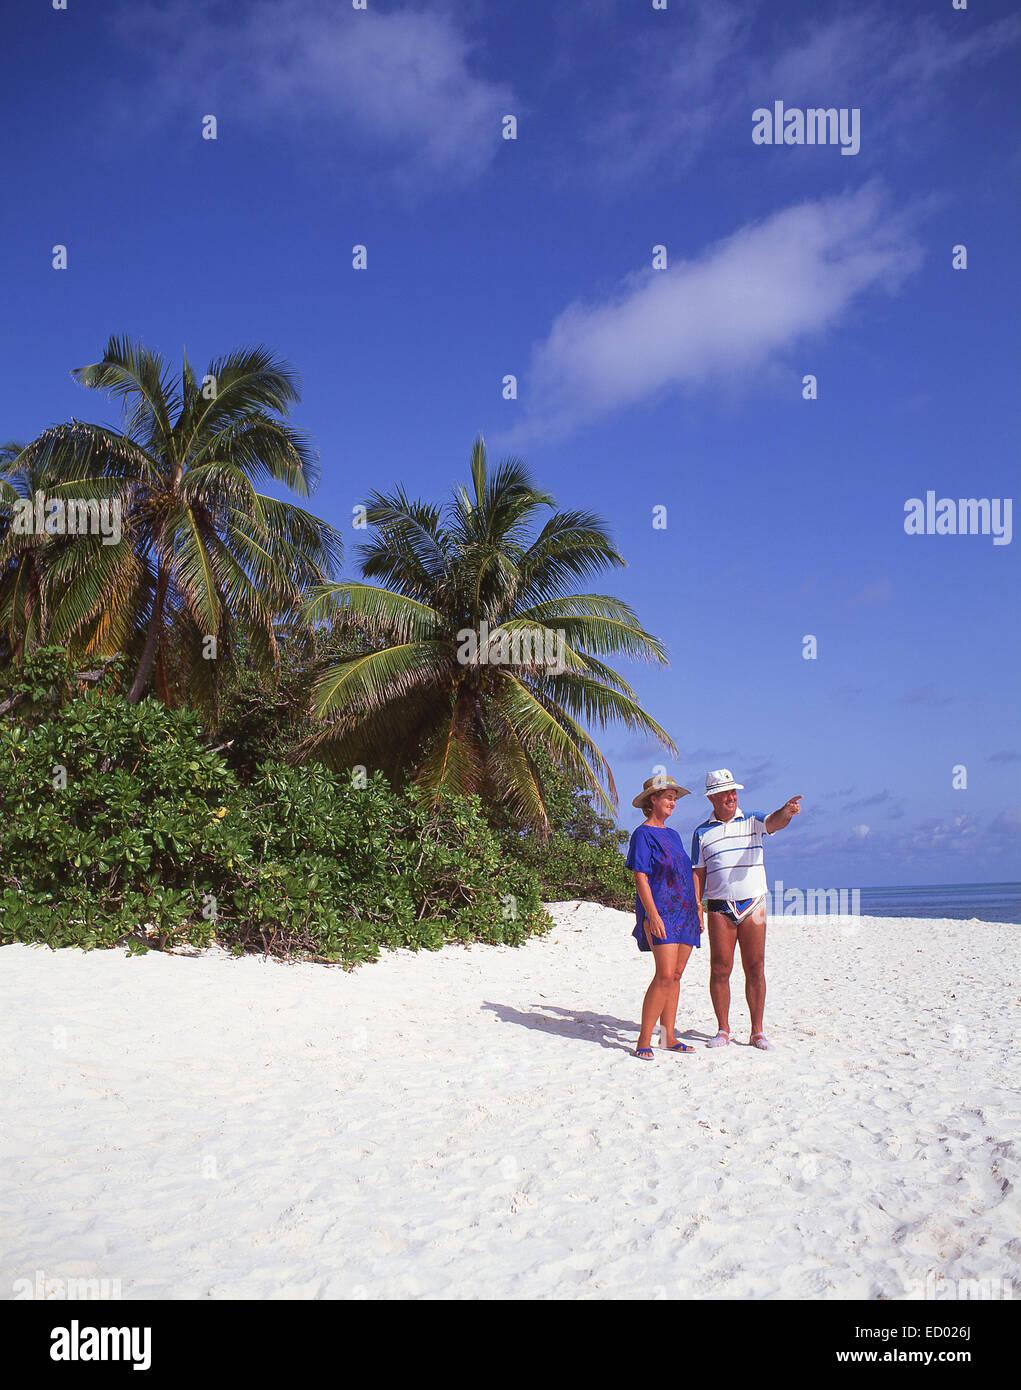 Older couple on beach, Île aux Cerfs Island, Flacq District, Republic of Mauritius - Stock Image